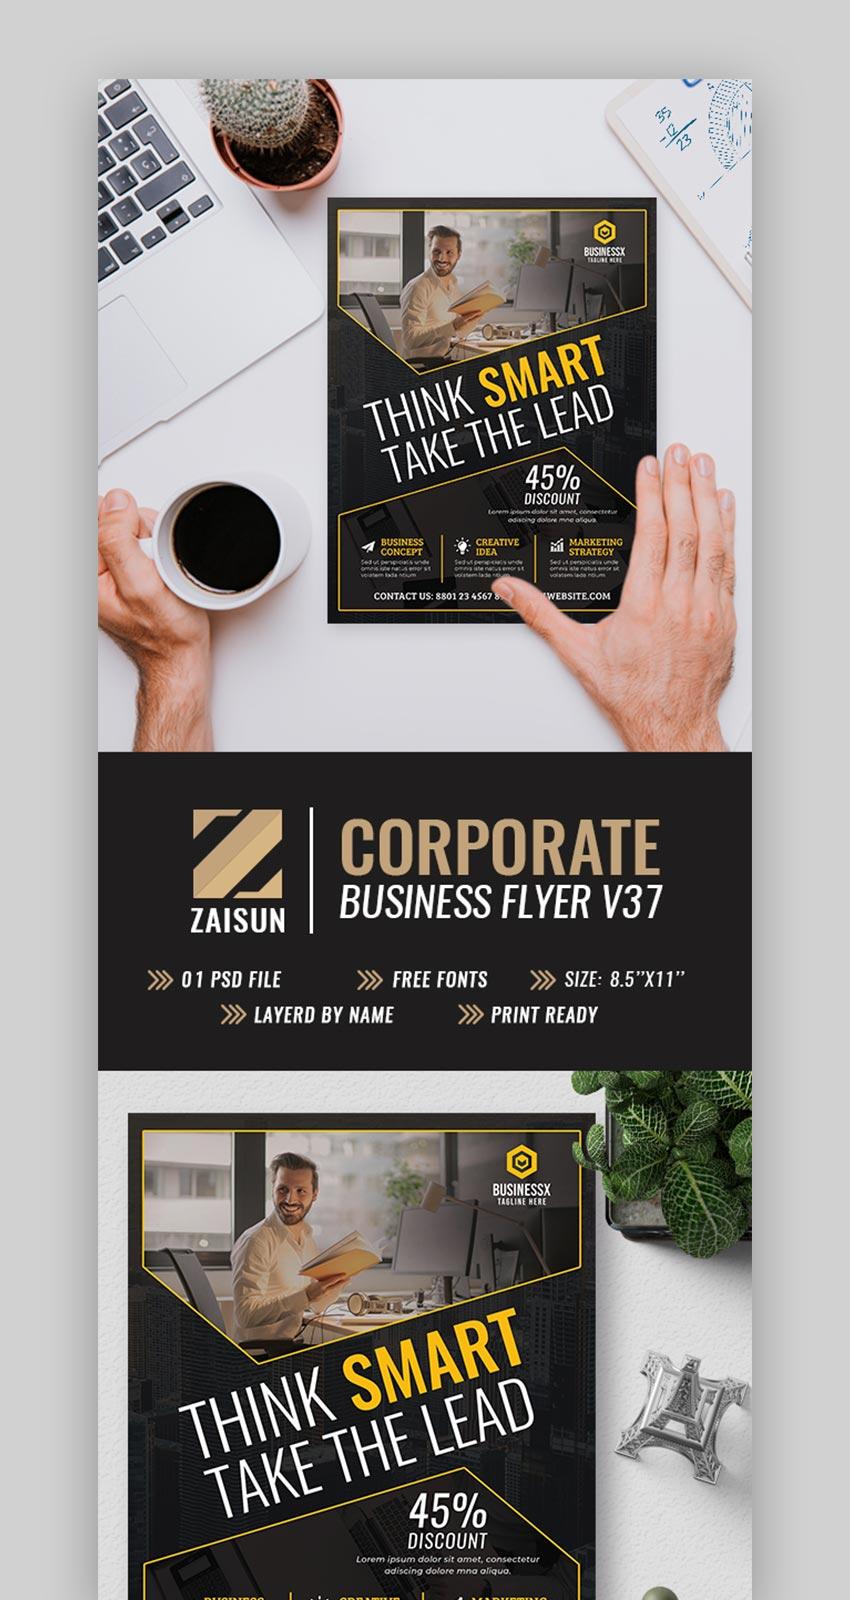 Corporate Business Flyer V37